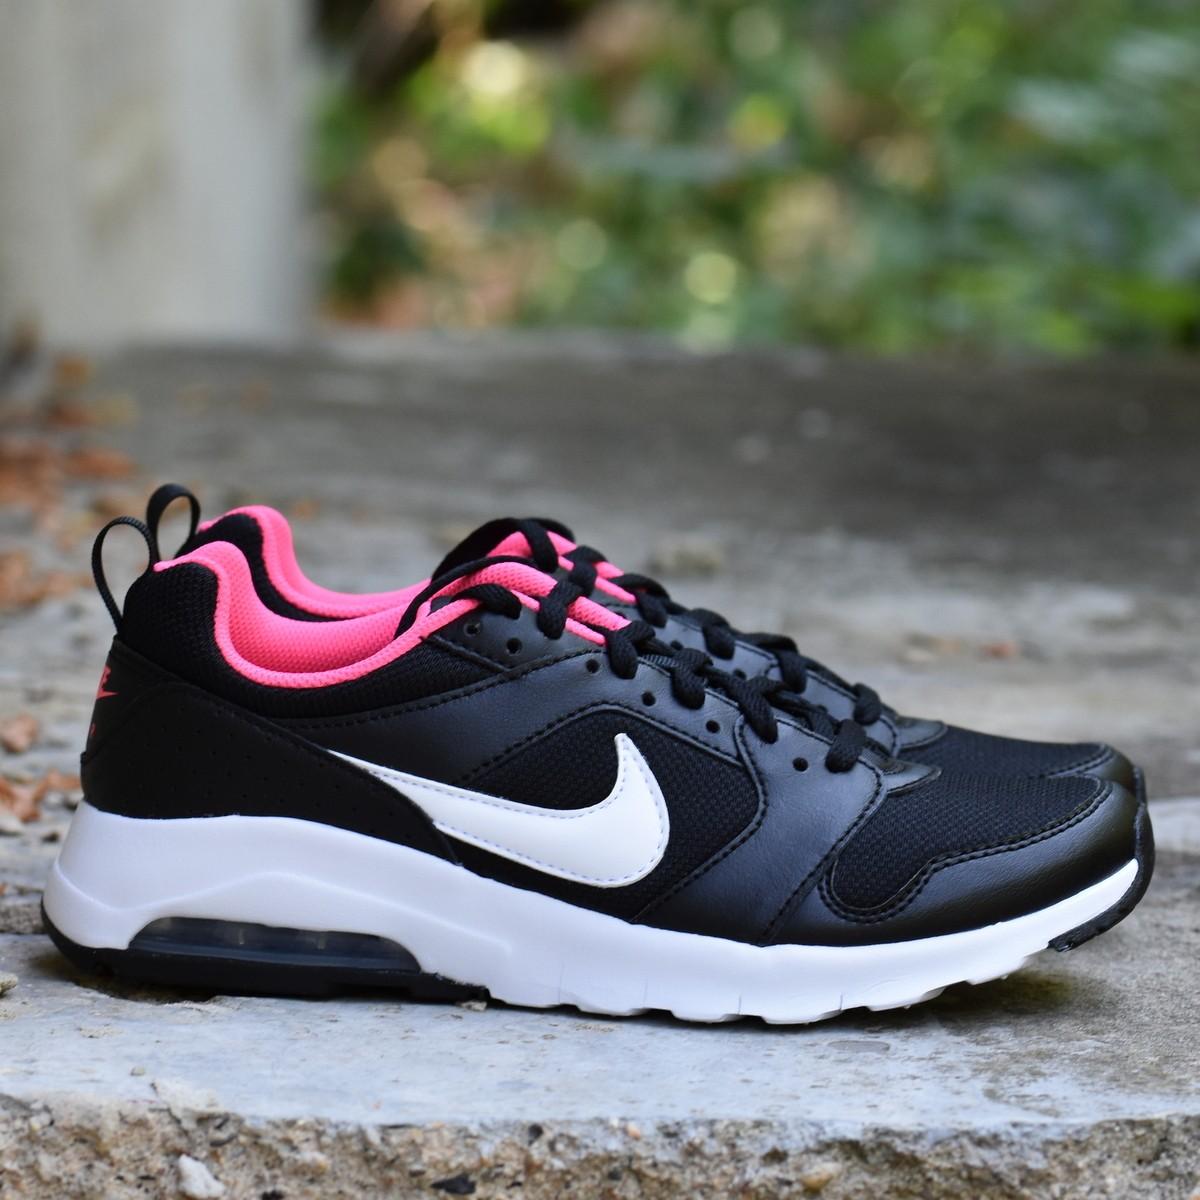 Nike AIR MAX MOTION (GS) Dětské boty EU 35.5 869957-001 3ed60bb44e